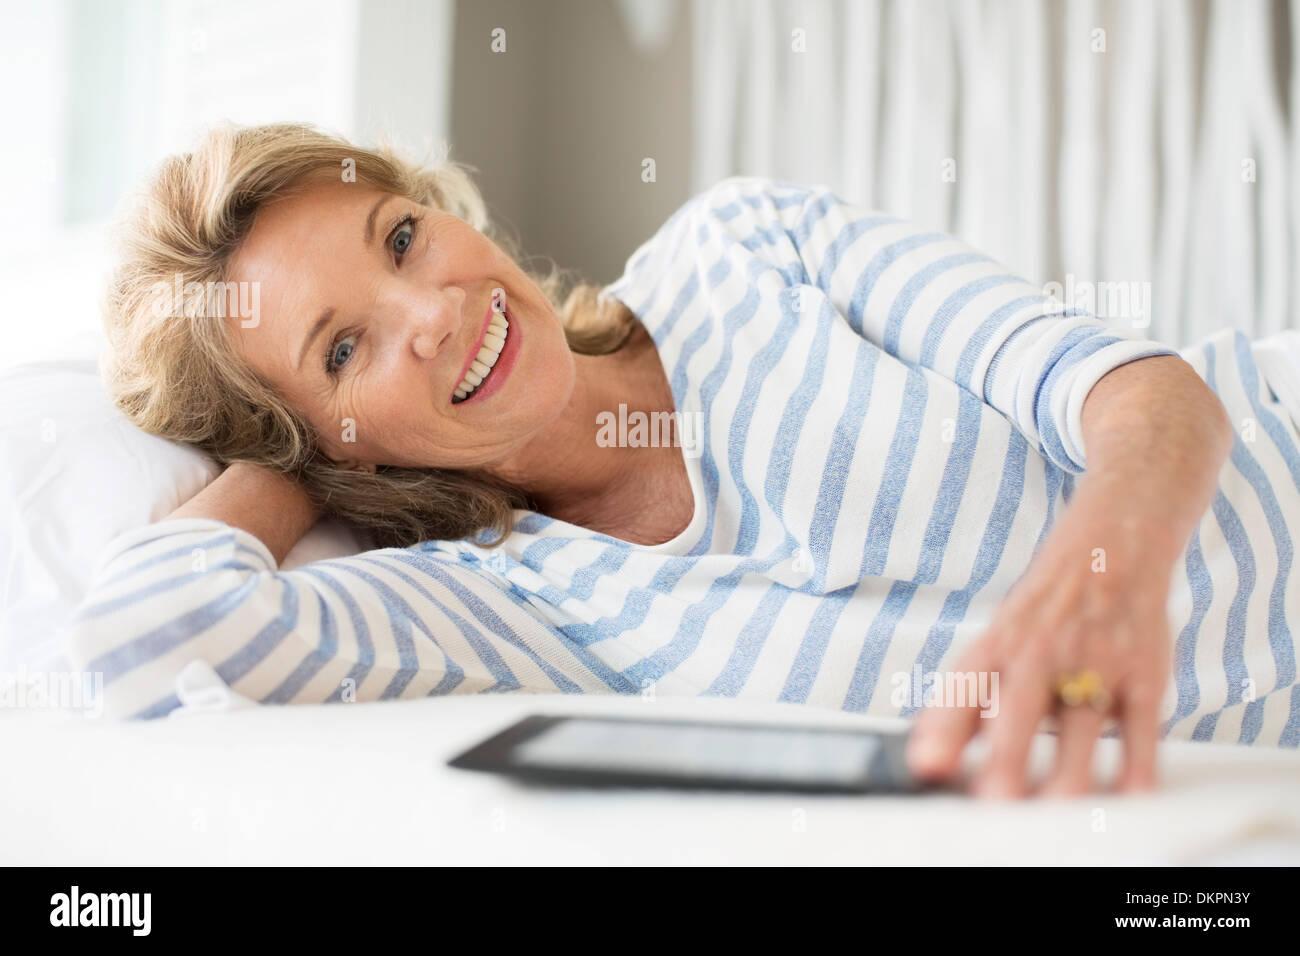 Older woman using digital tablet on bed - Stock Image